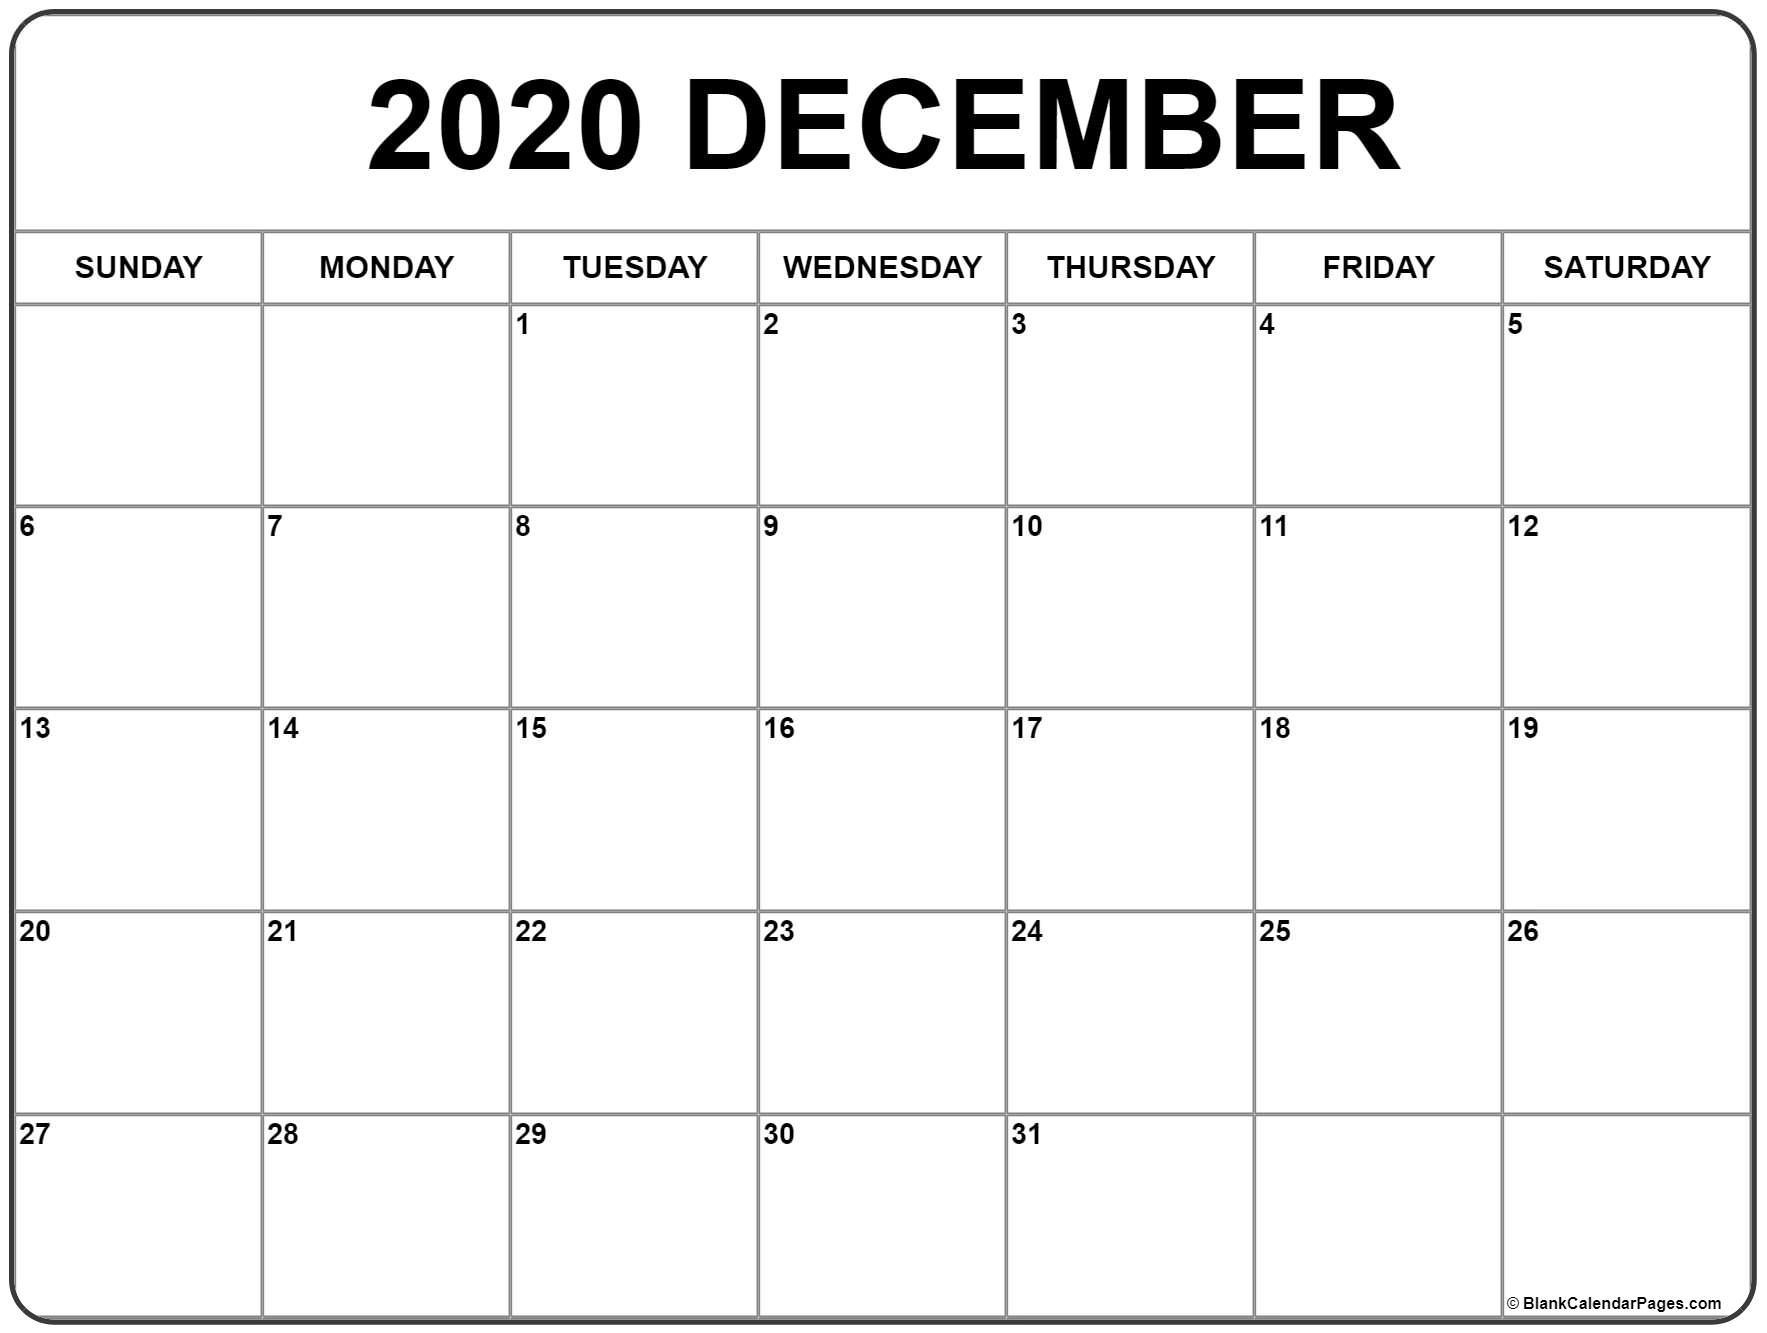 December 2020 Printable Calendar Template #2020Calendars-Blank Fill In Calendars 2020 Printable